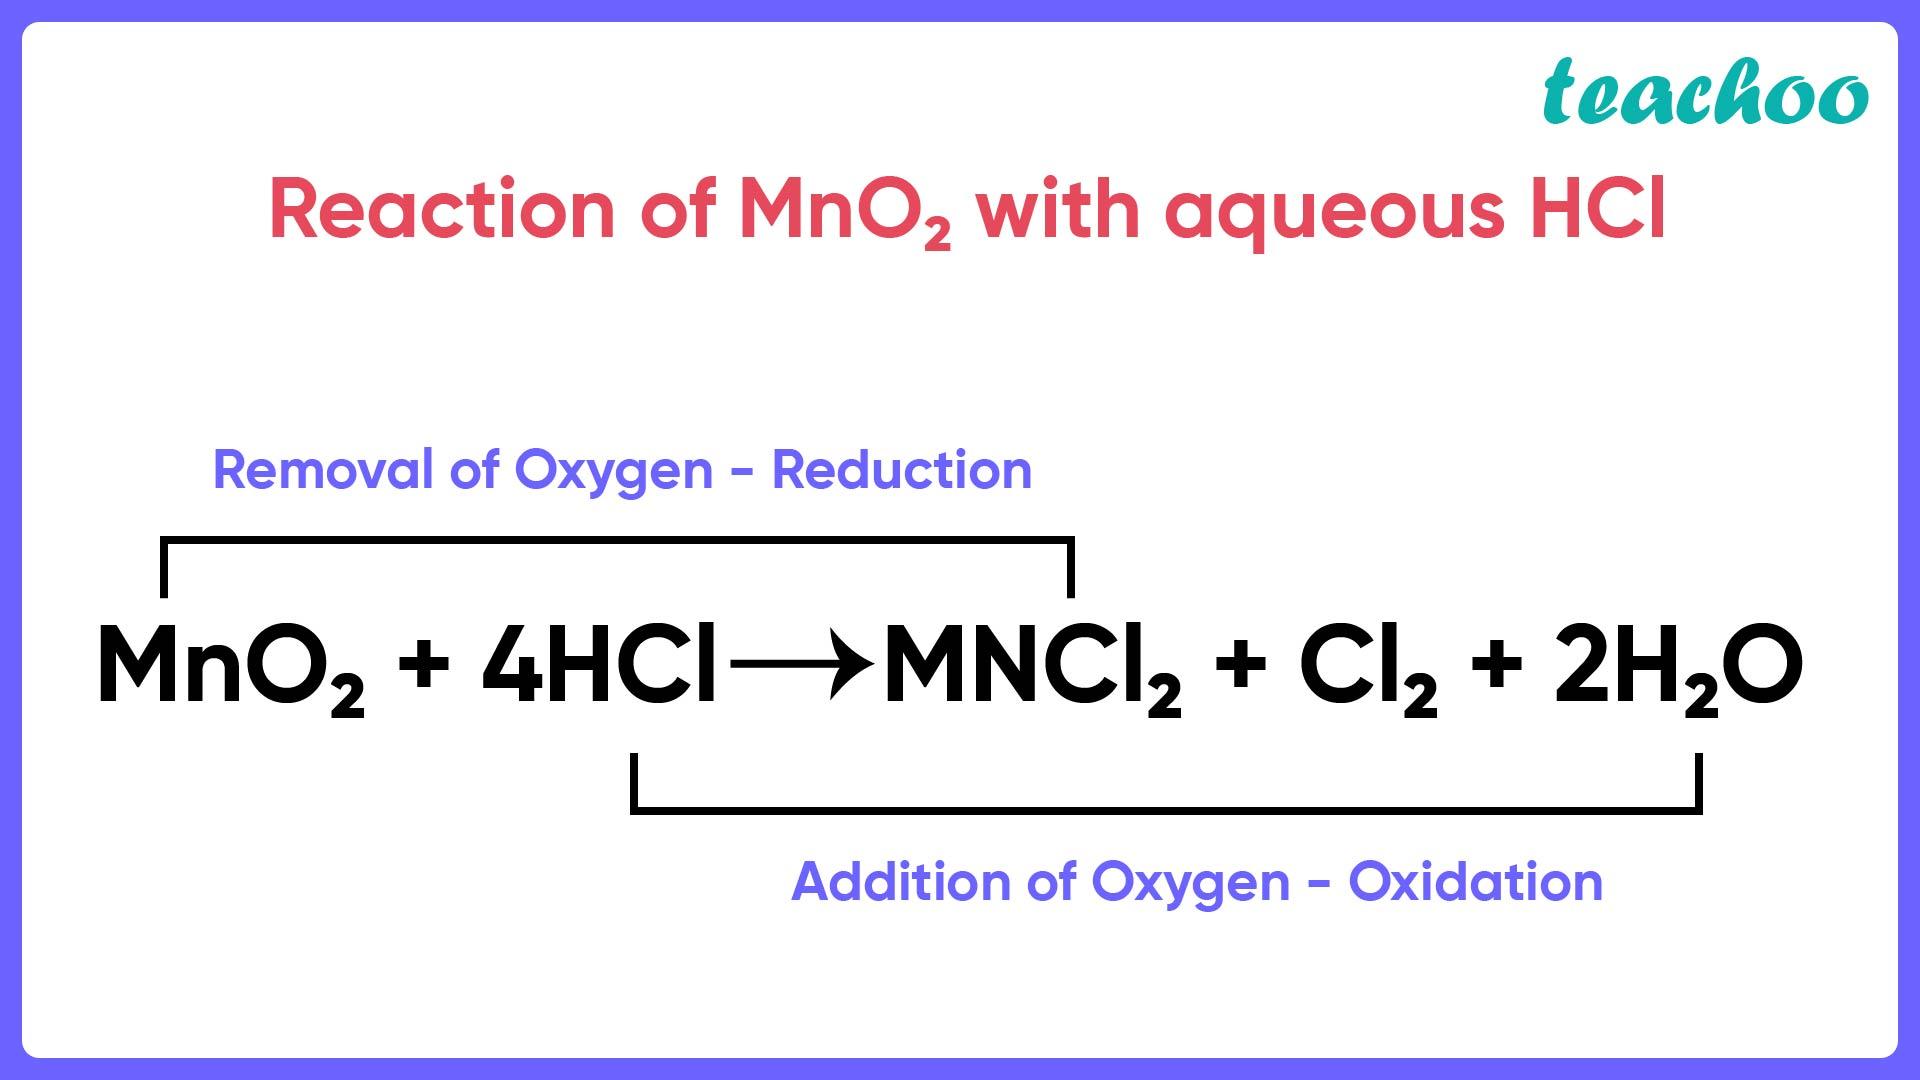 Reaction of MnO2 with aqueous HCl-01 - Teachoo.jpg